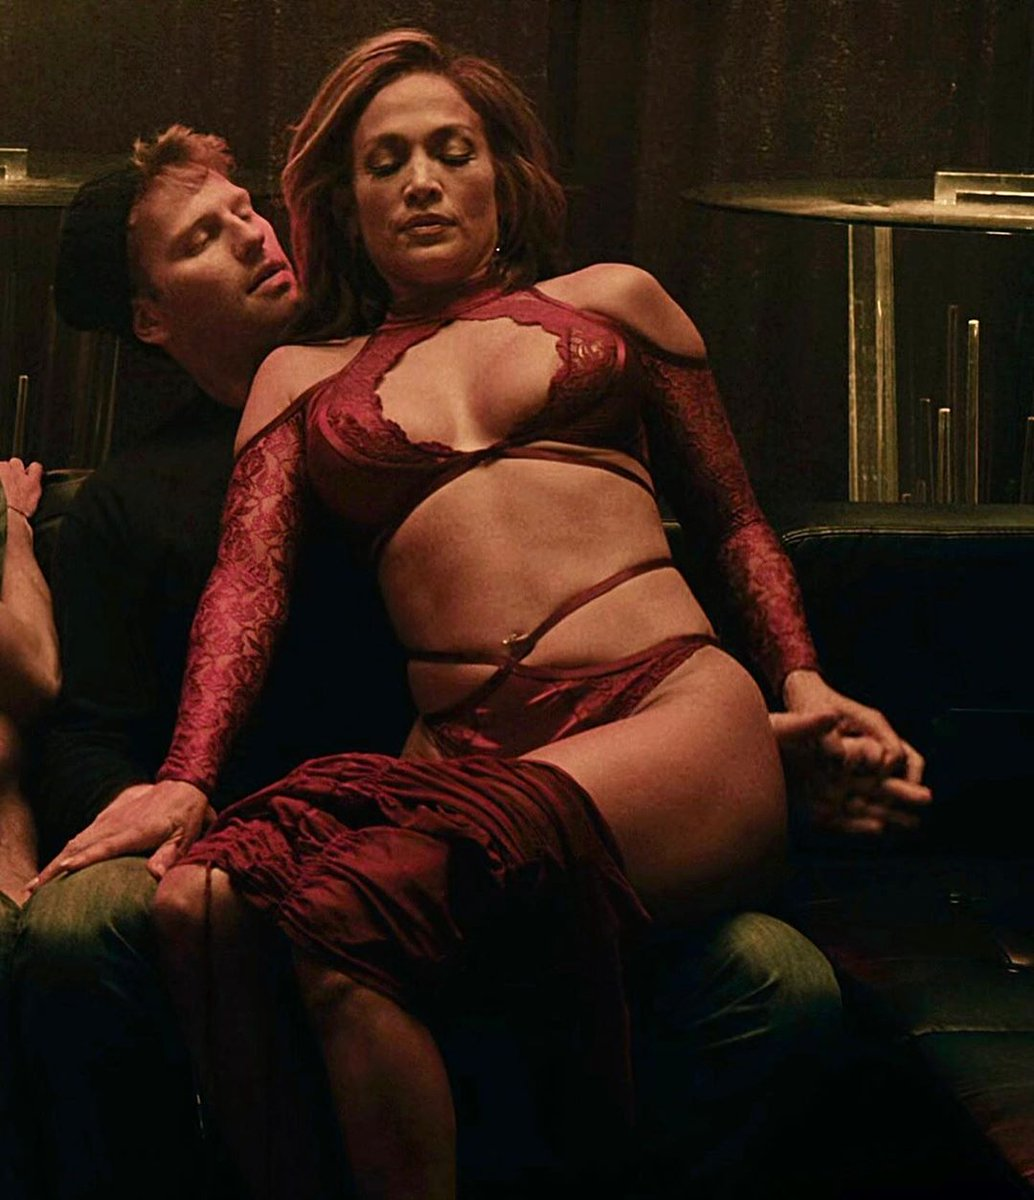 Jennifer lopez sex scene pics